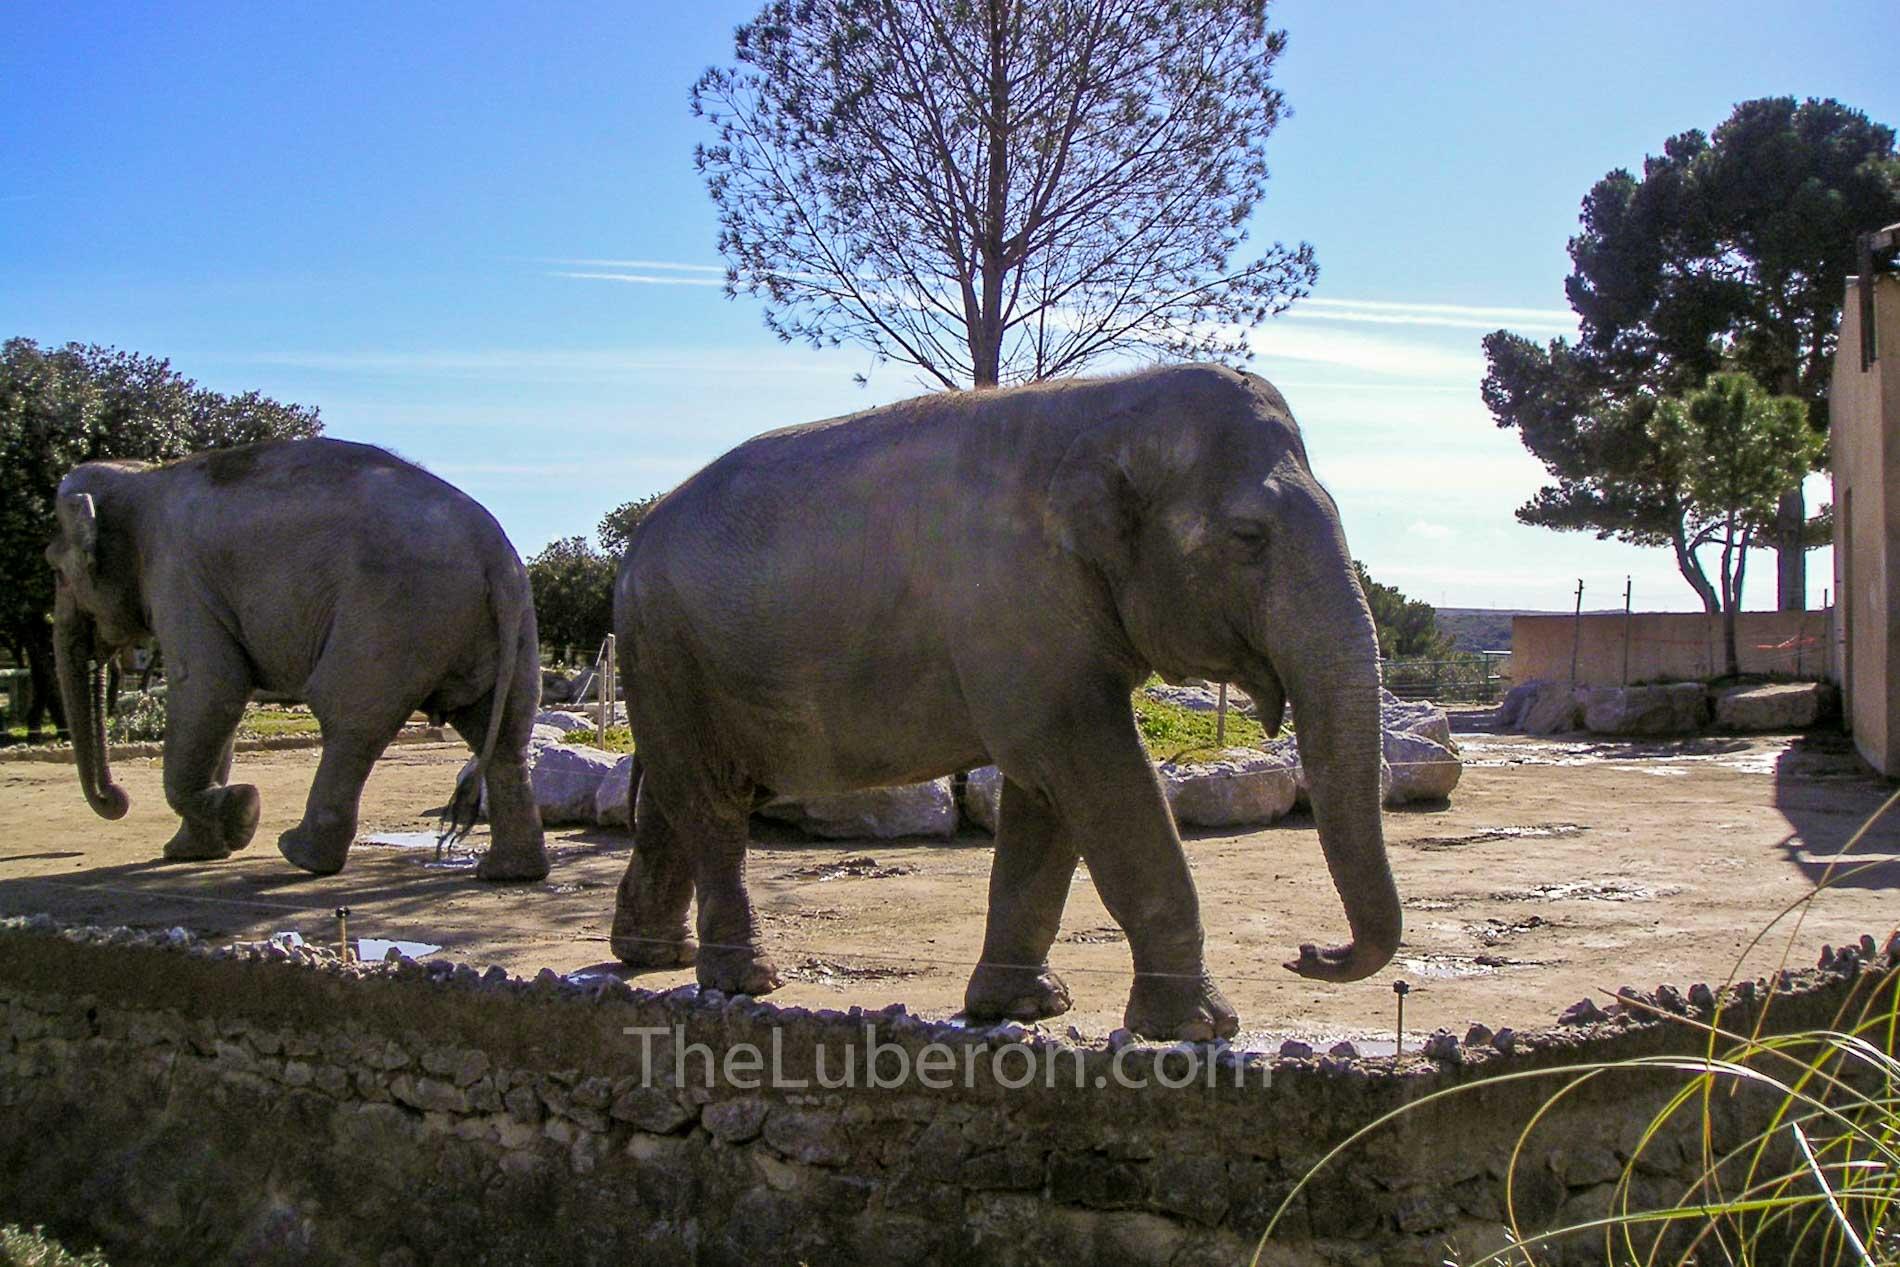 Elephants at Barben Zoo